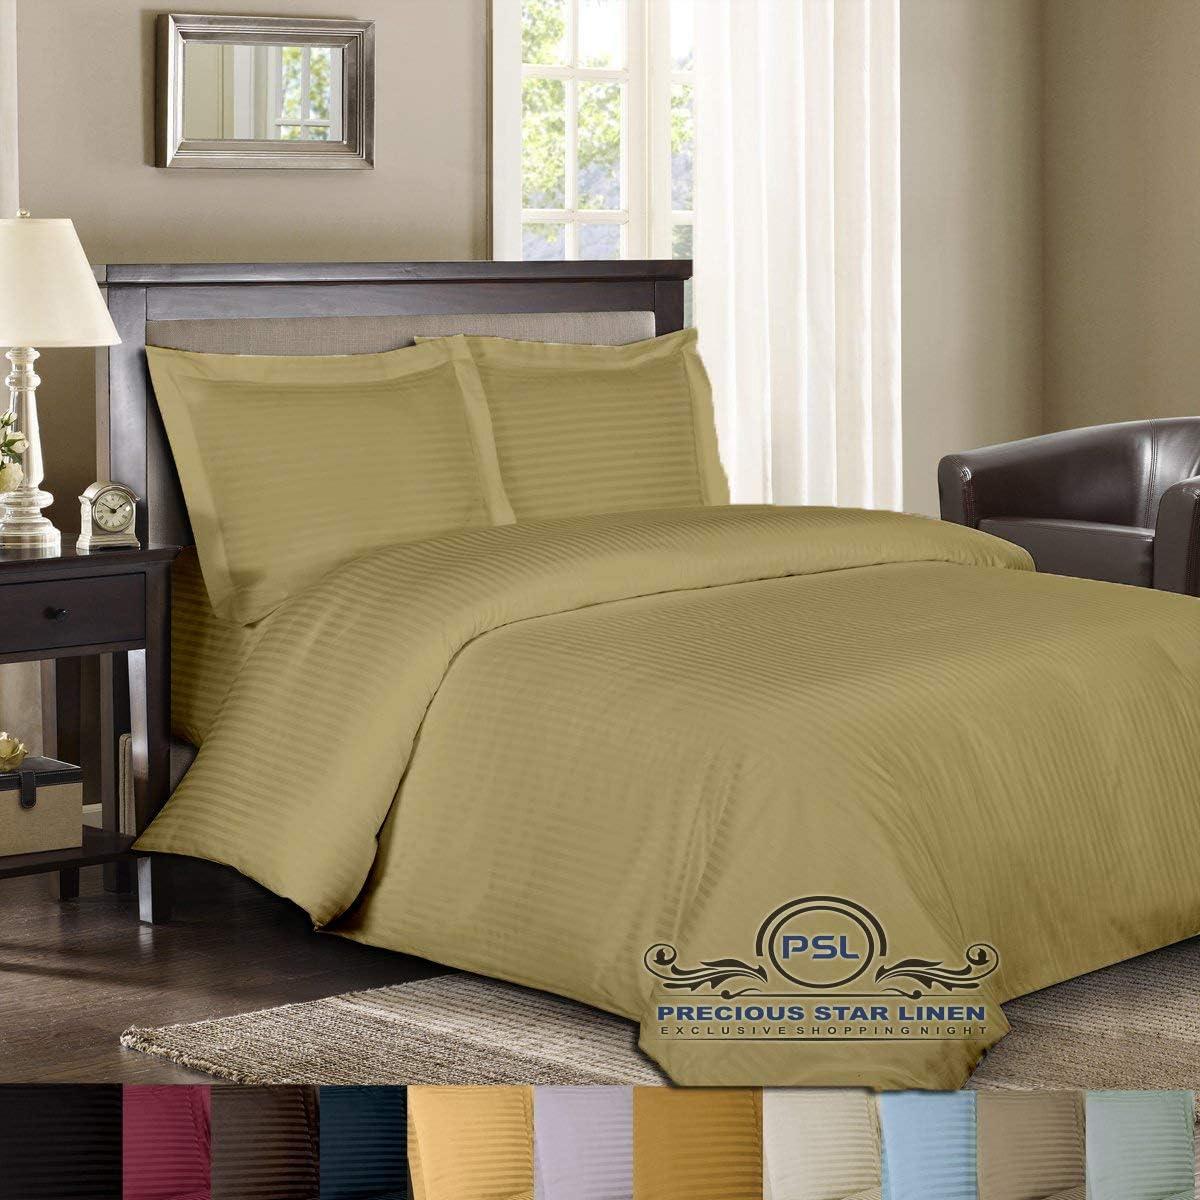 Precious Star Linen Hotel Quality Overseas parallel import regular item 800 Thread 3pc Duvet Count Max 60% OFF Cov